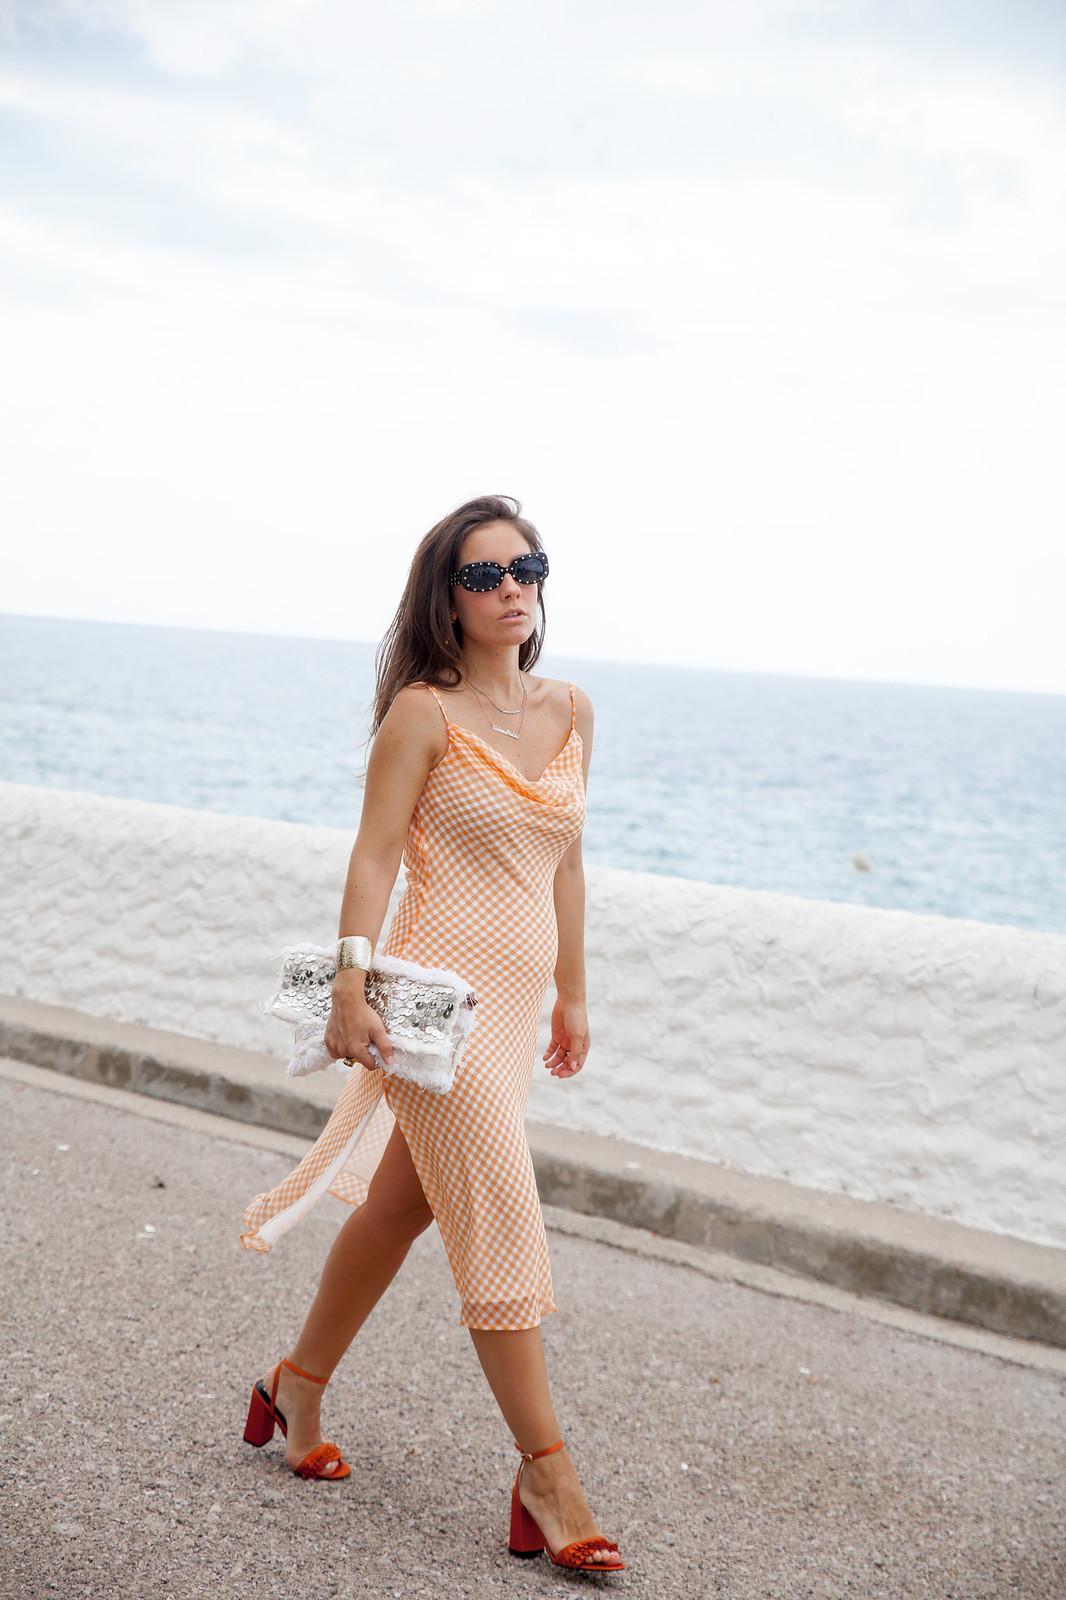 04_LPA_dress_revolve_ambassador_spain_influencer_theguestgirl_supremenyc_hypebae_laura_santolaria